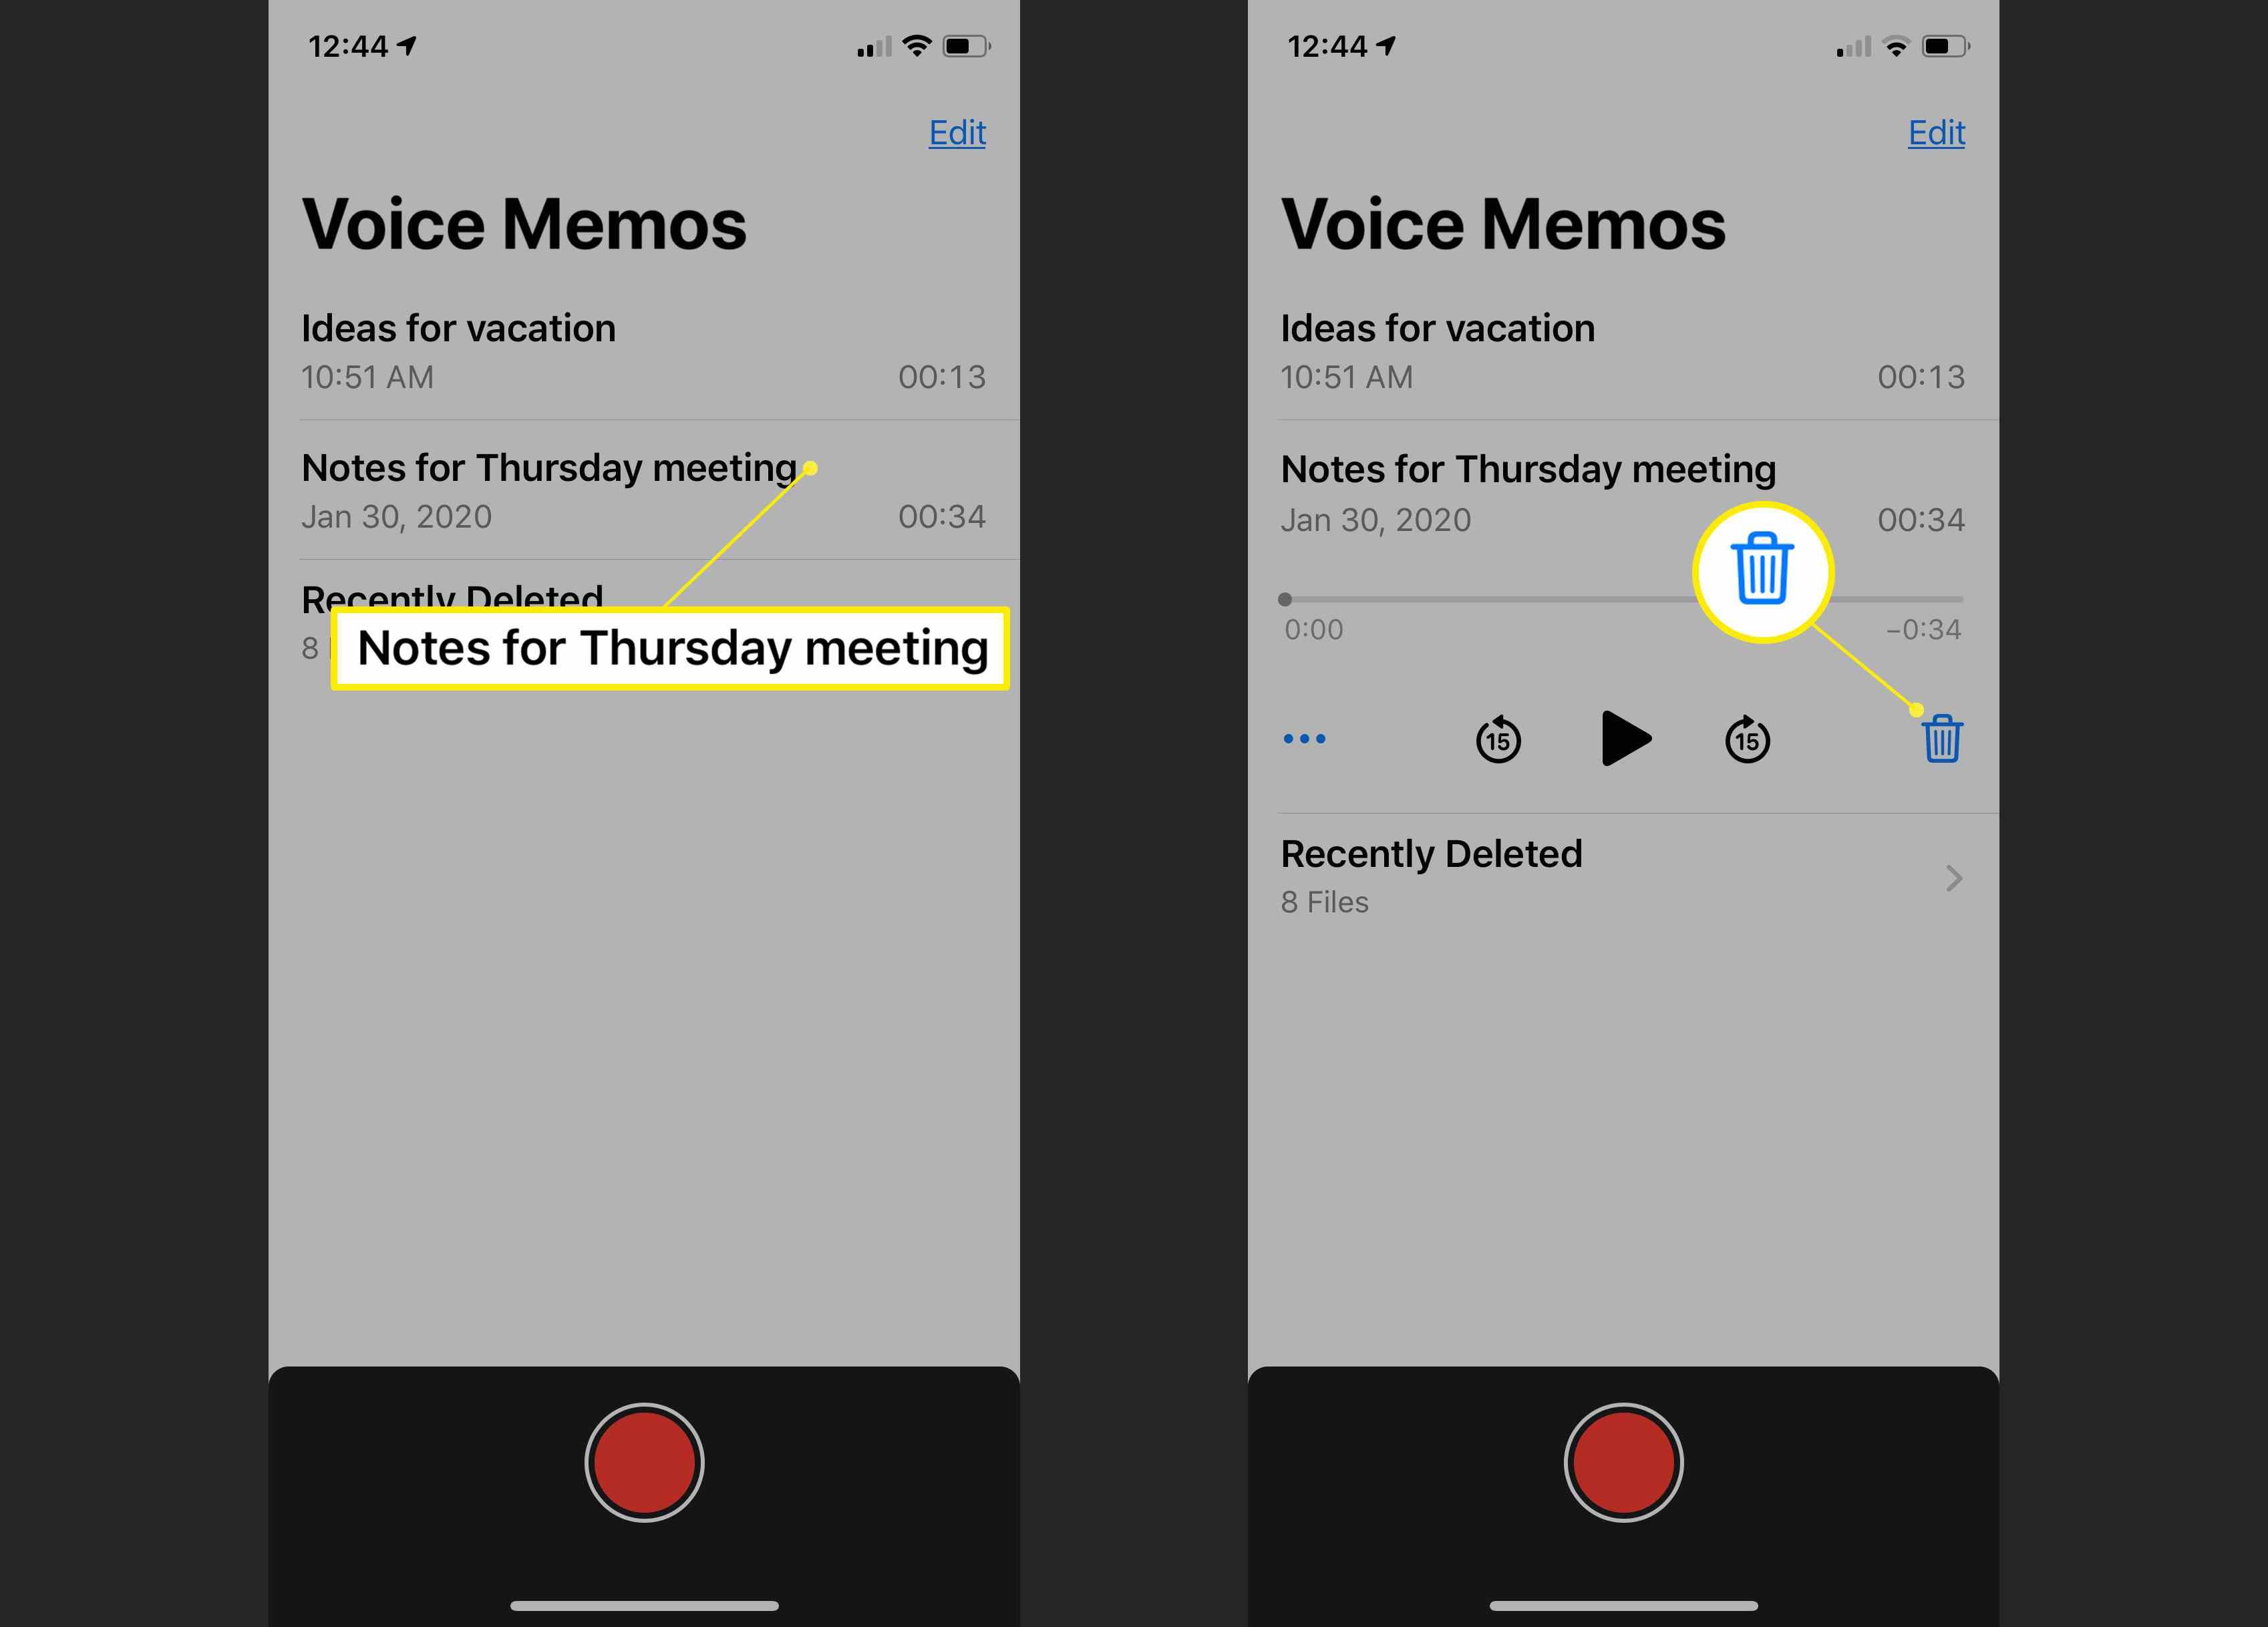 Voice Memos app showing the deletion process